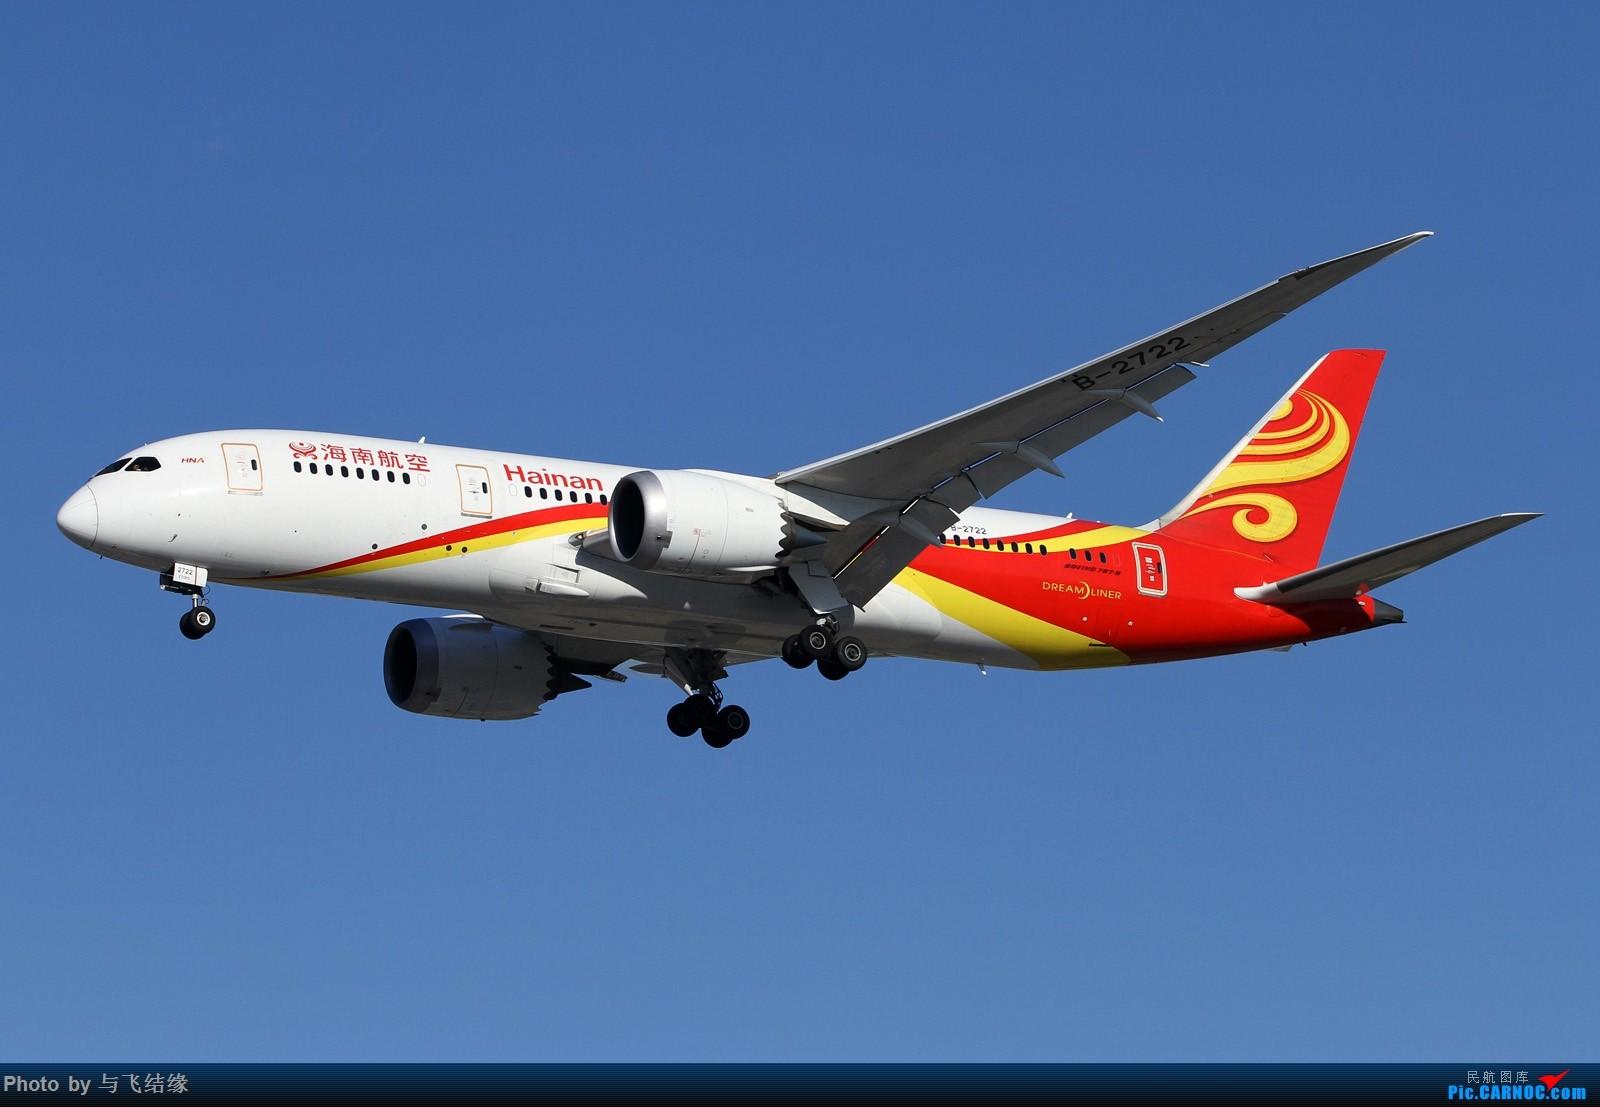 "Re:[原创]山东航空最新波音737-800彩绘机""好客山东—景芝号""及其其它的一些一些! BOEING 787-8 B-2722 中国北京首都国际机场"